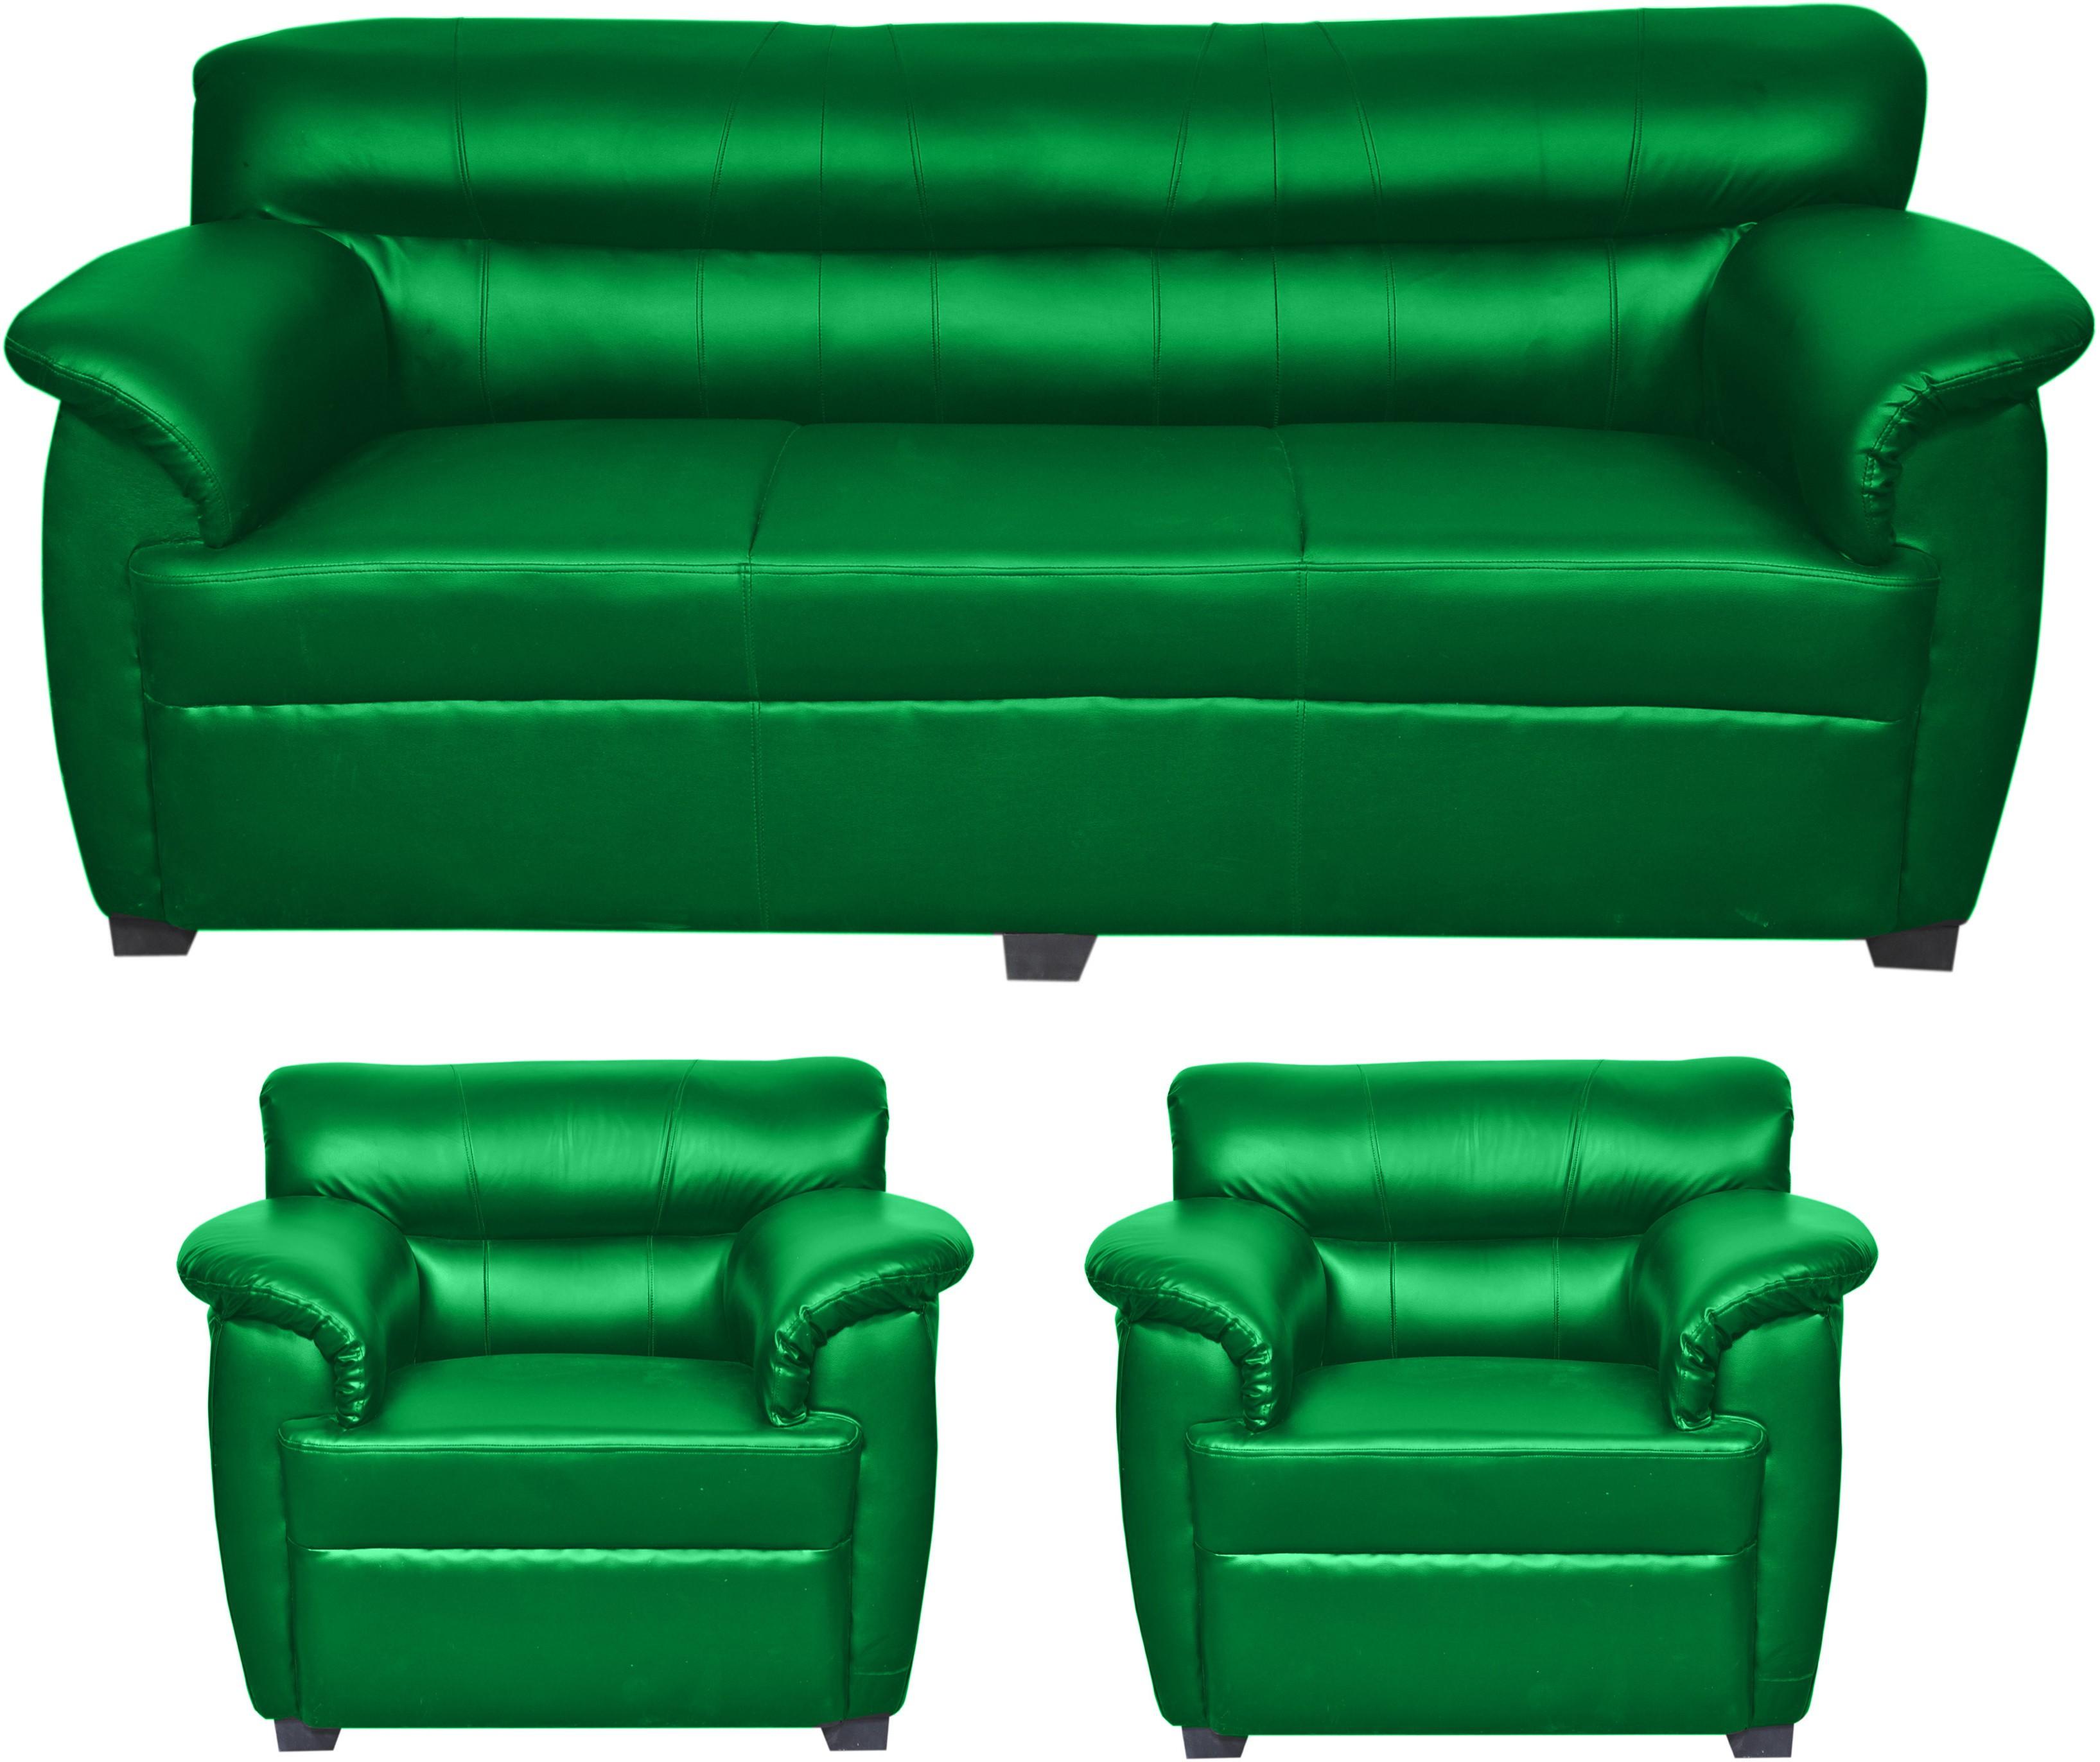 View HOMESTOCK Solid Wood 3 + 1 + 1 Green Sofa Set(Configuration - Straight) Furniture (HOMESTOCK)